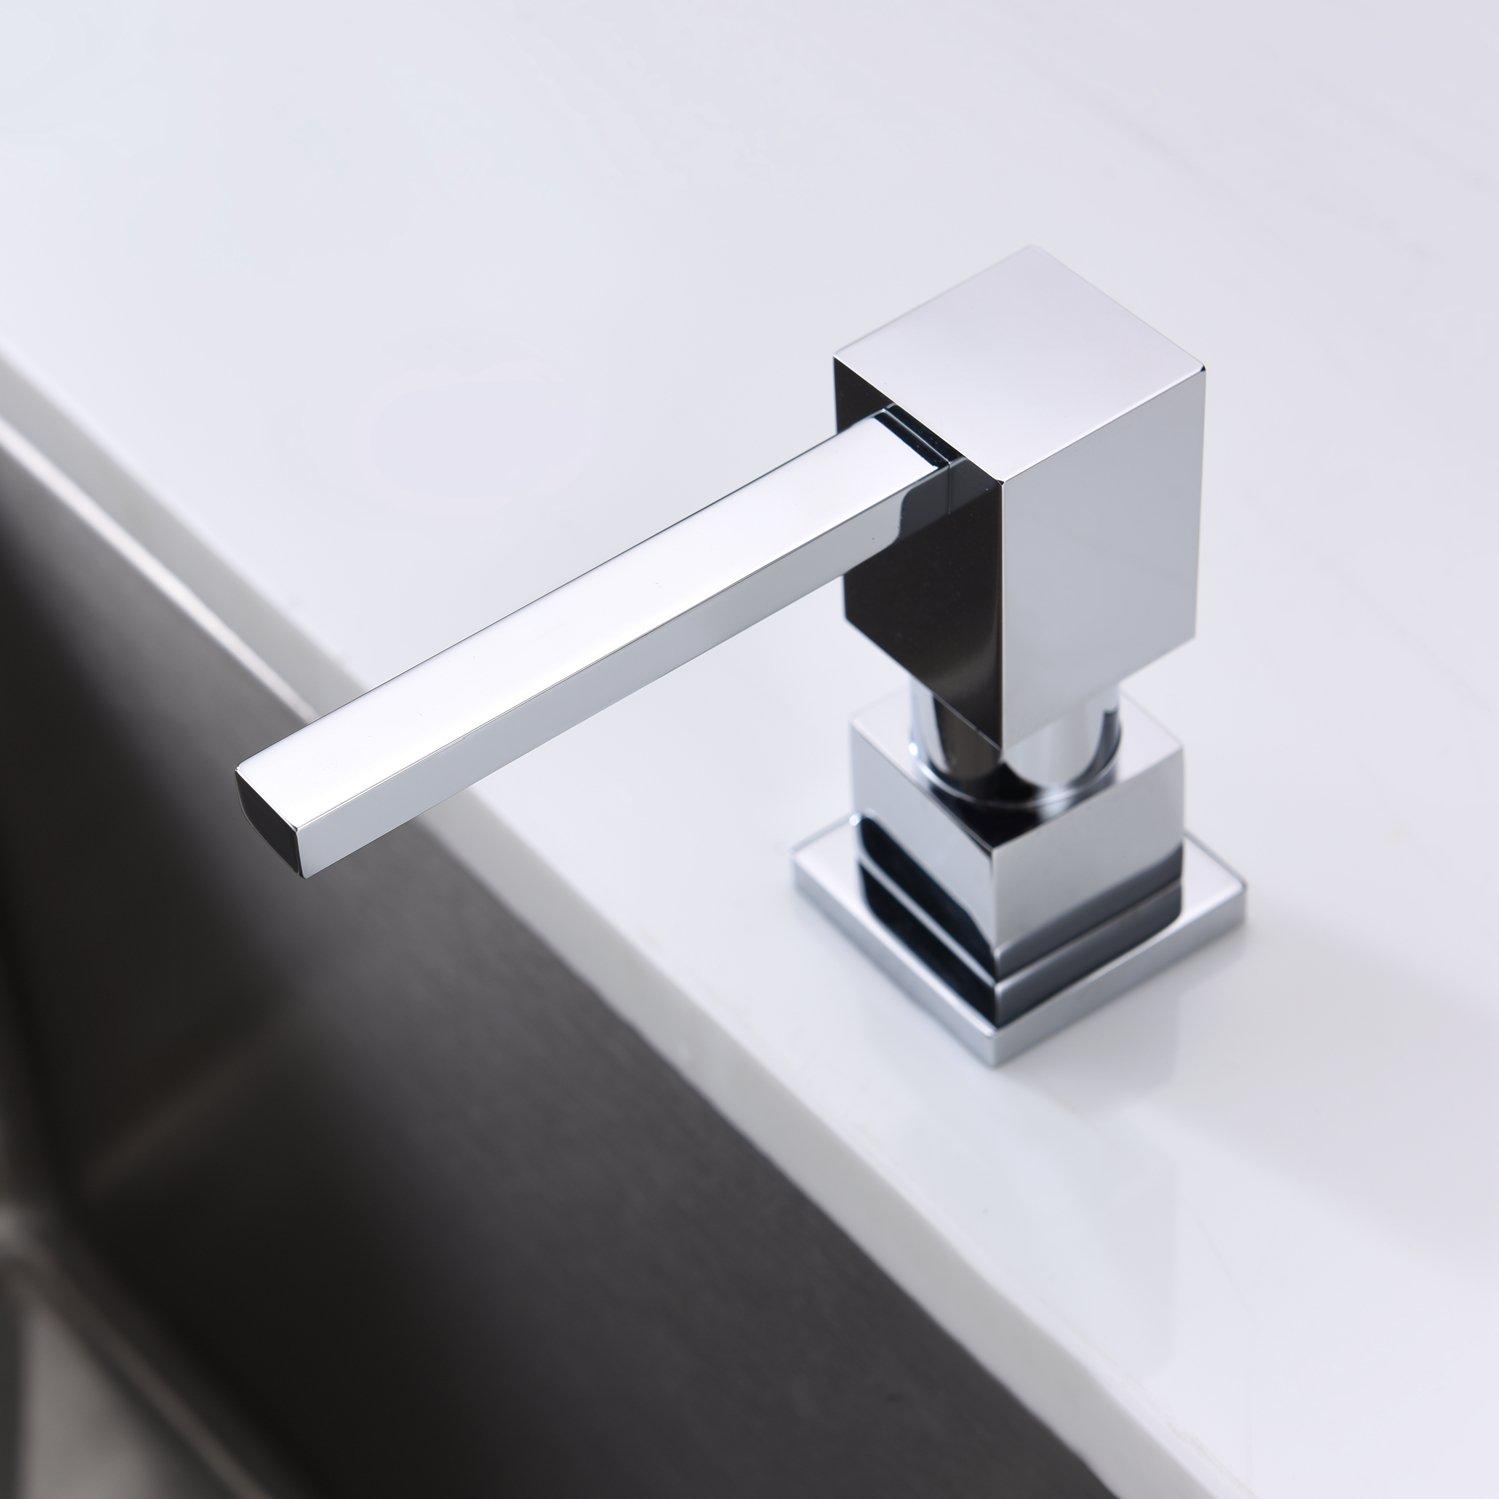 LAZADA Modern Chrome Built in Pump Kitchen Sink Dish Soap Dispenser, Dish Kitchen Soap Dispenser Pump by Fonveth (Image #2)